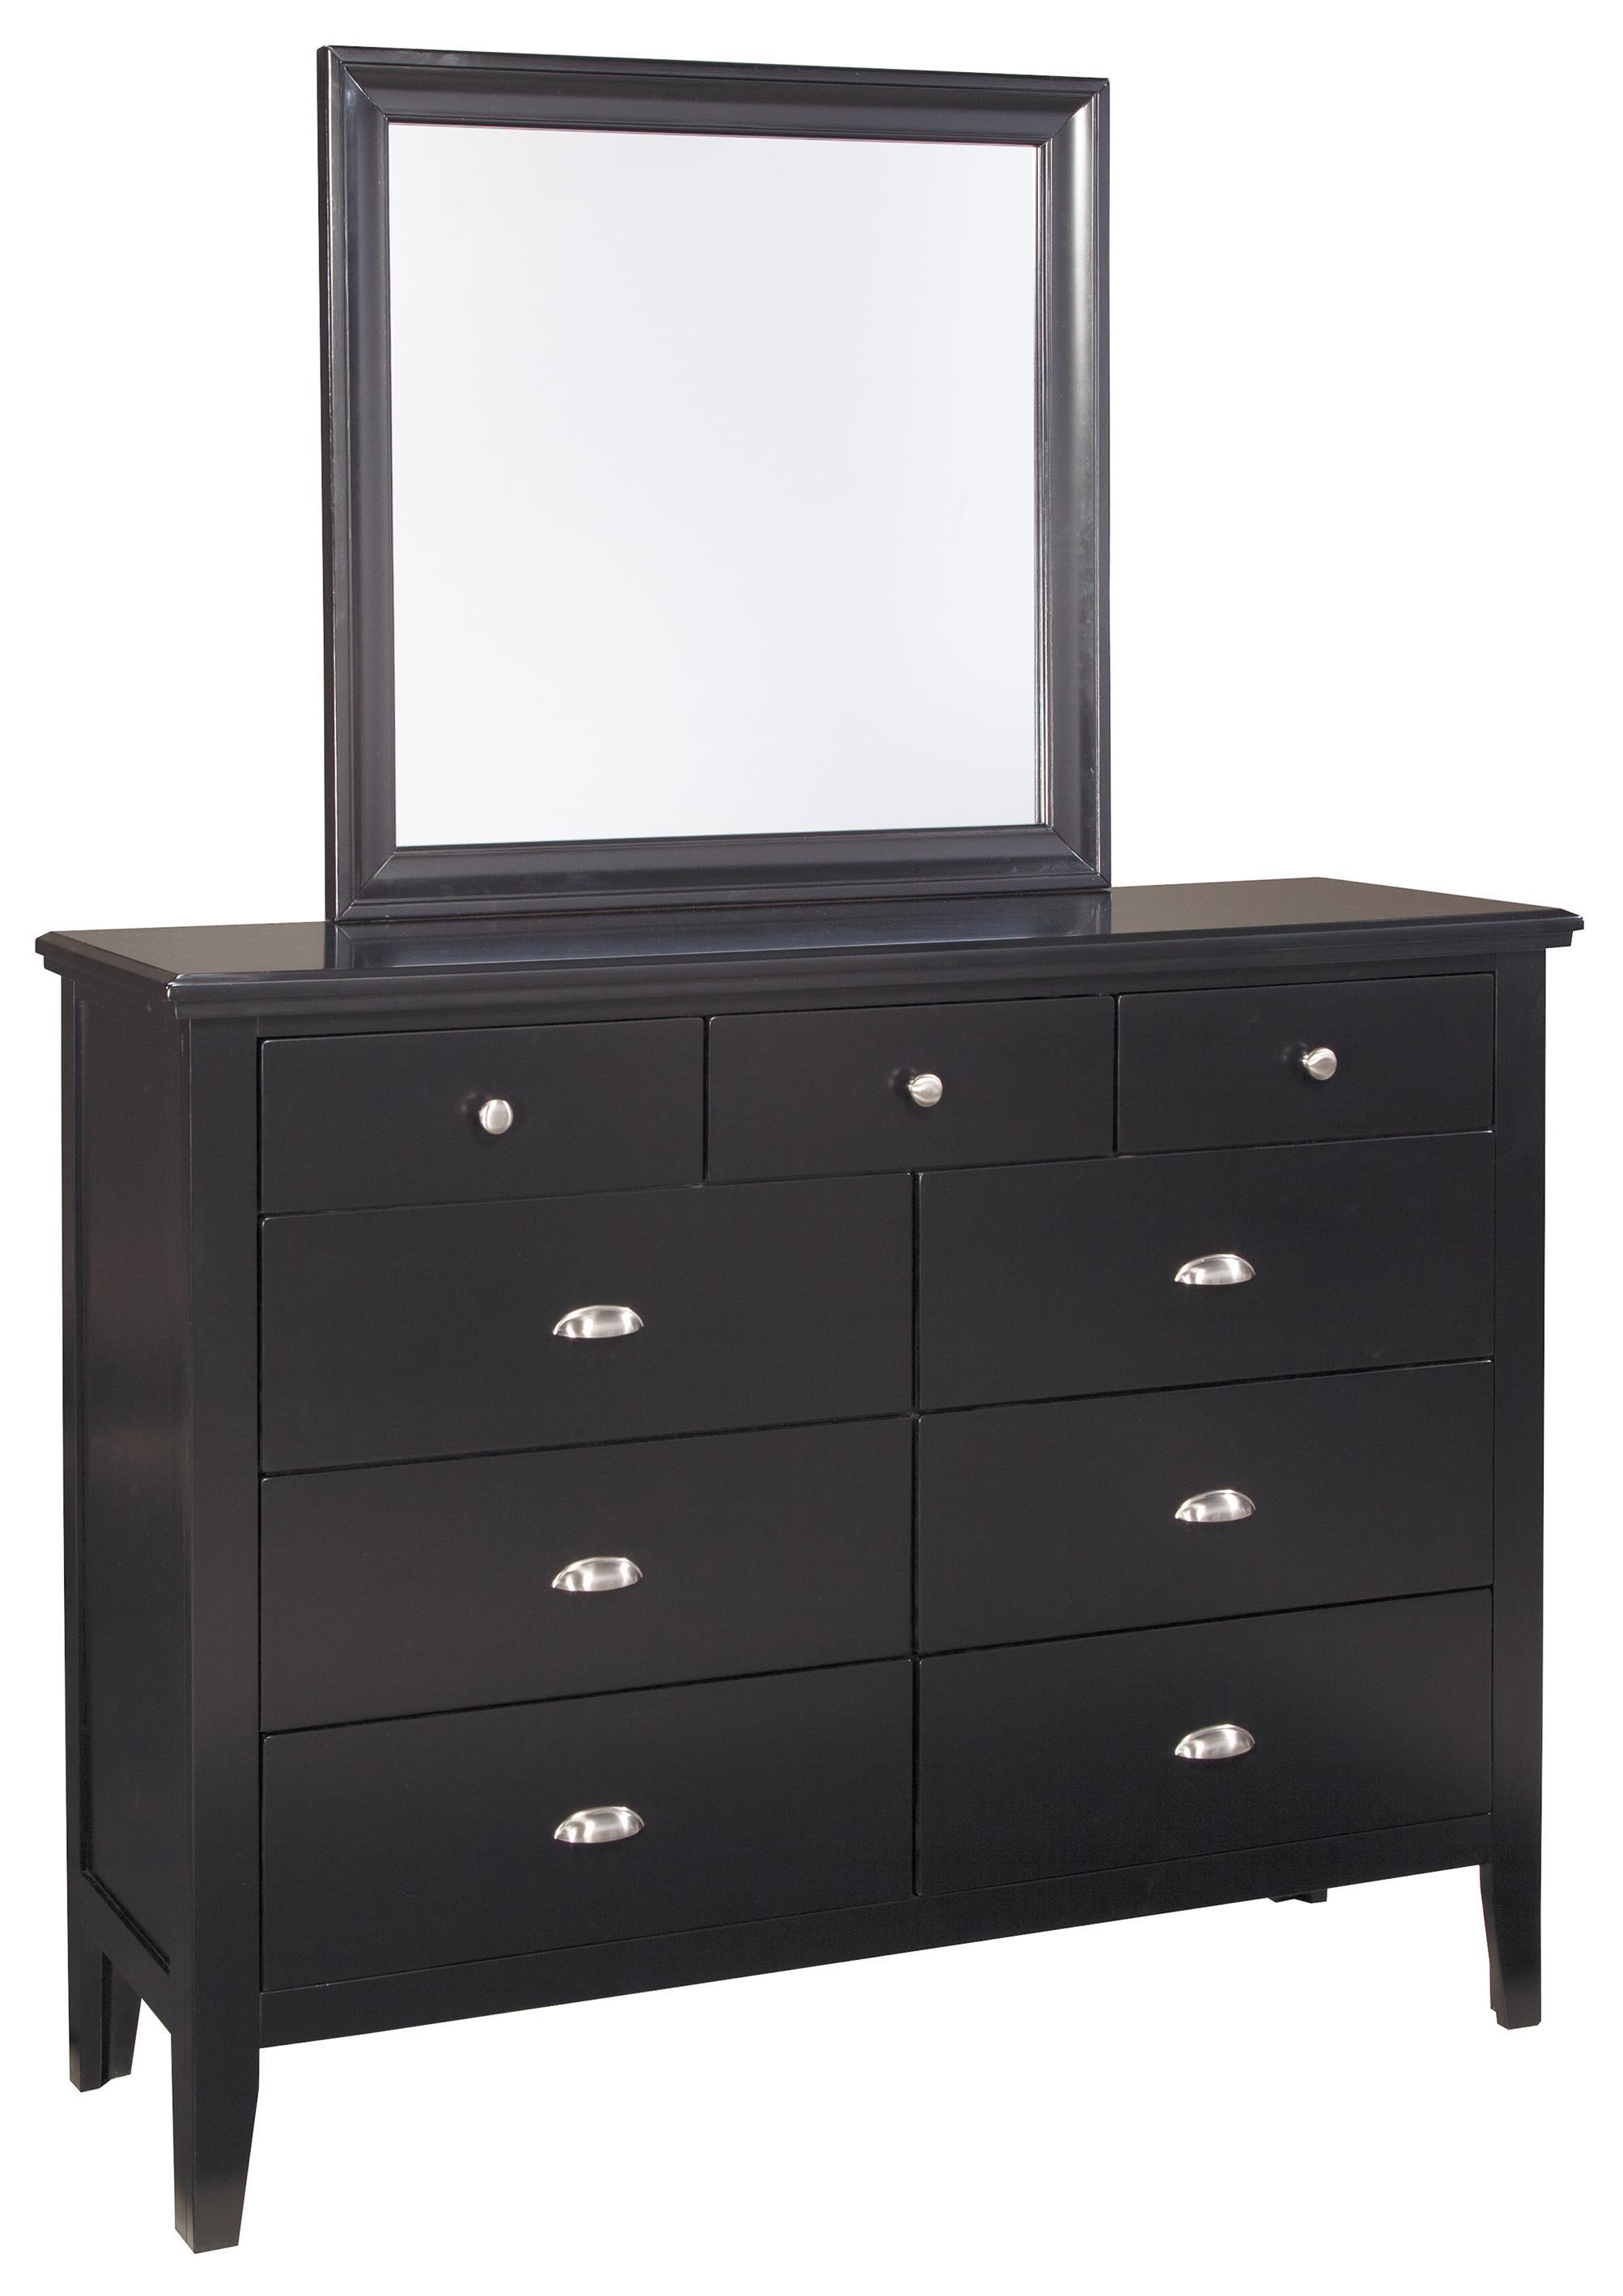 Signature Design by Ashley Braflin Dresser & Bedroom Mirror - Item Number: B591-31+36